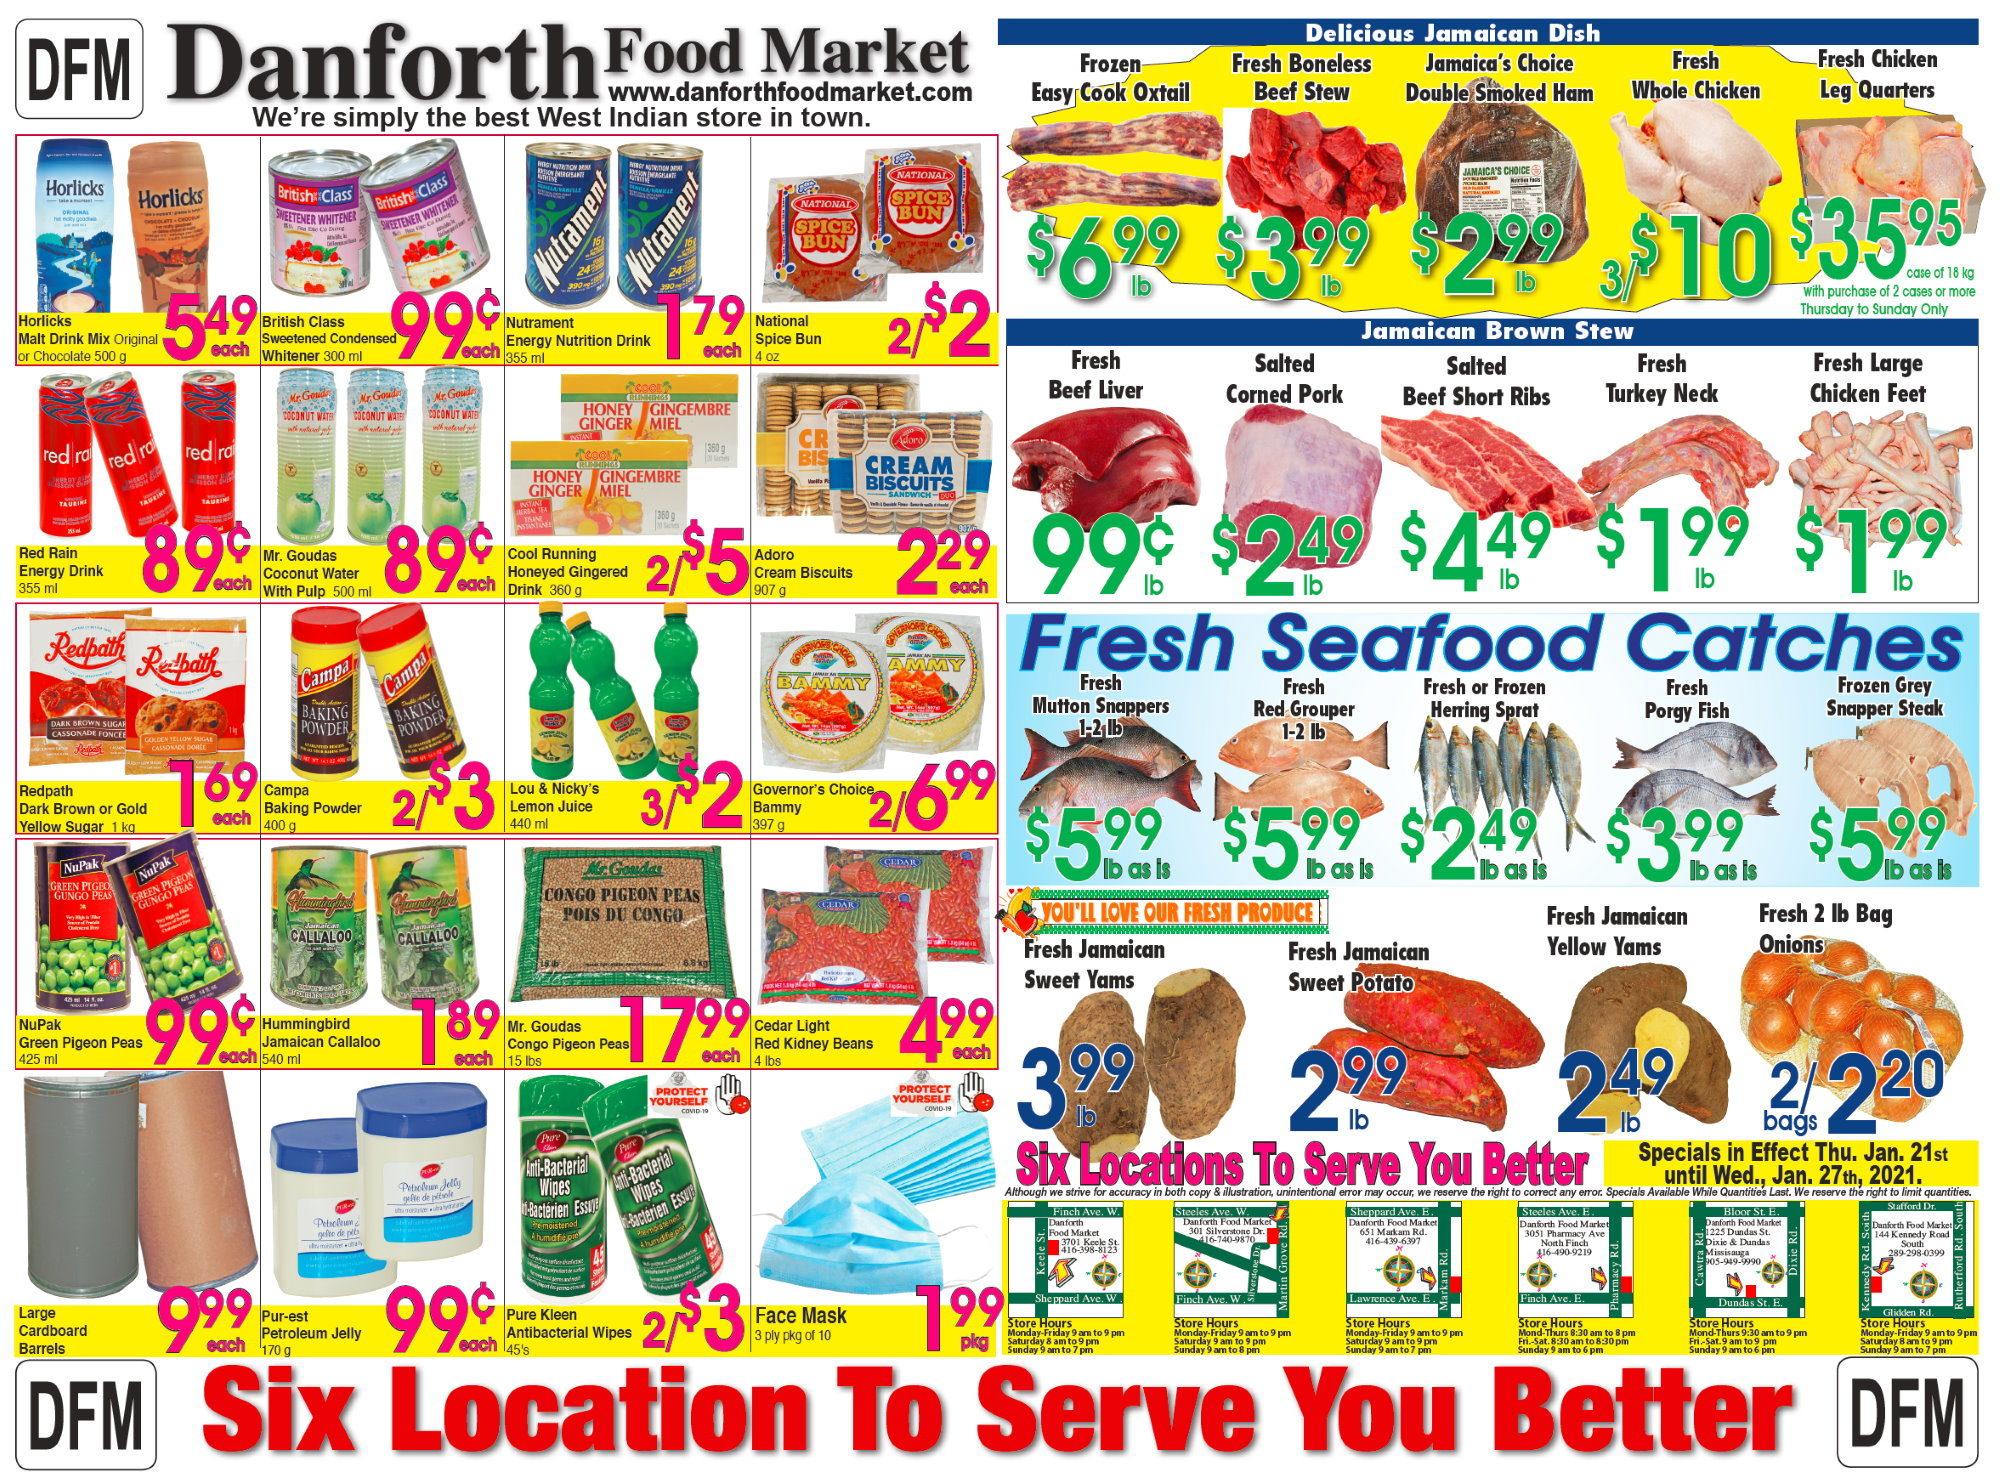 Danforth Food Market - Weekly Specials